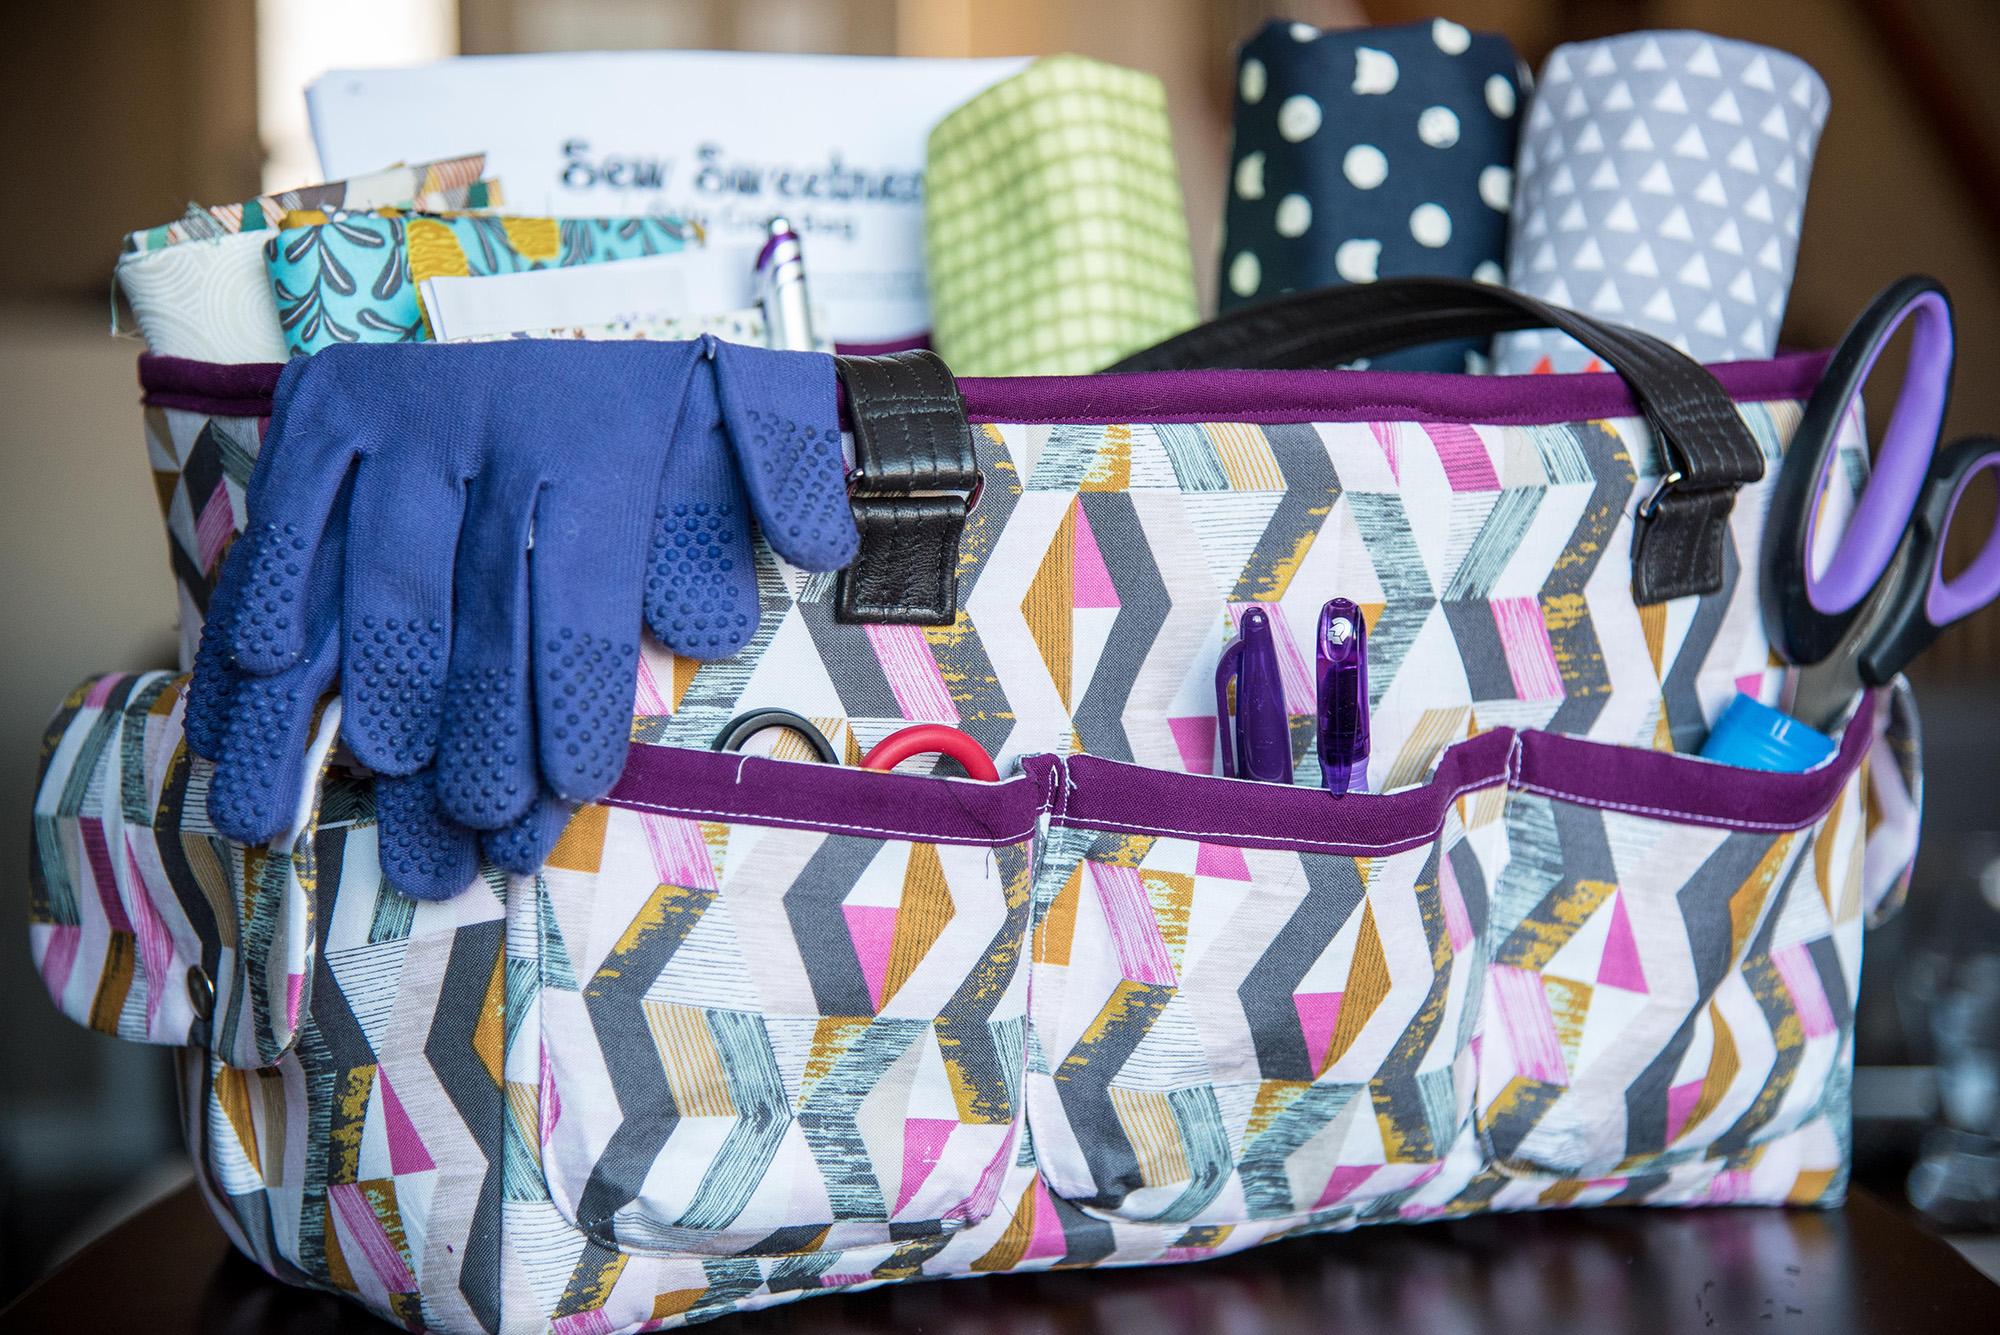 Sew Sweetness Oslo Craft Bag, sewn by Trina